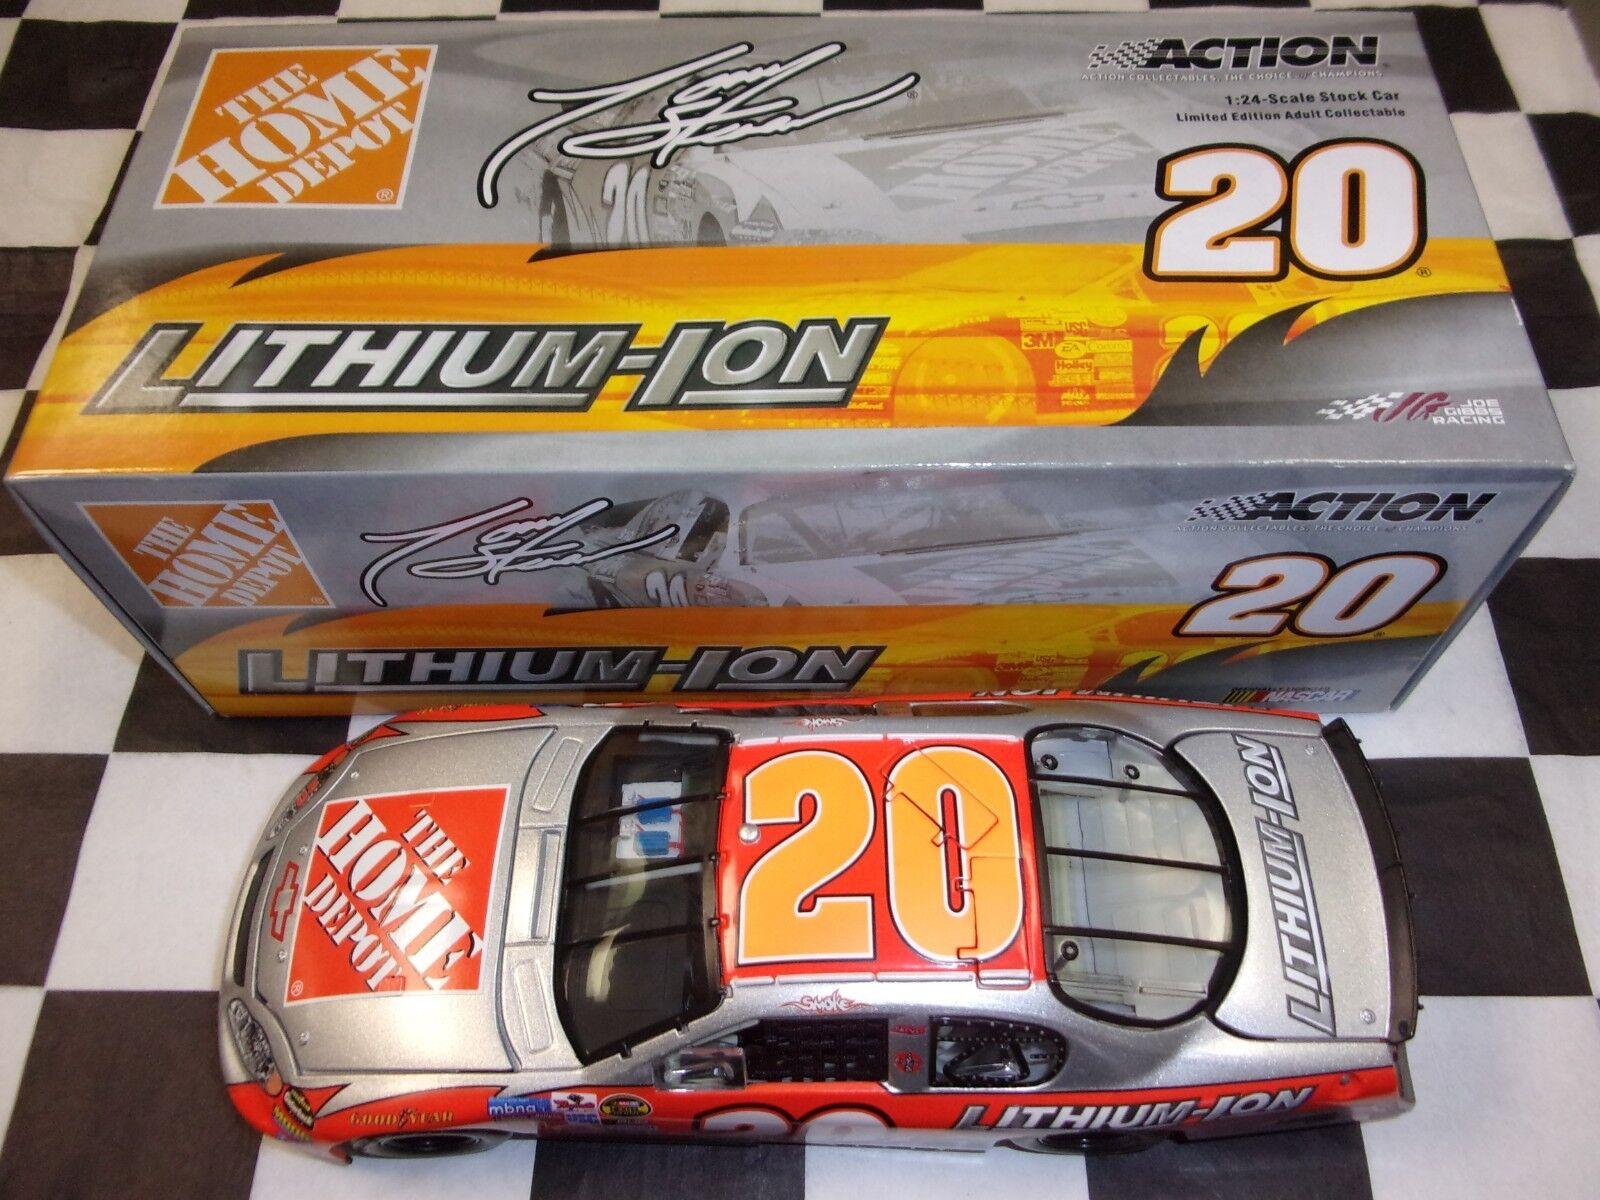 Tony Stewart   20 Home Depot Lithium-Ion 2005 Monte NASvoiture Action 1 24 scale voiture  branché